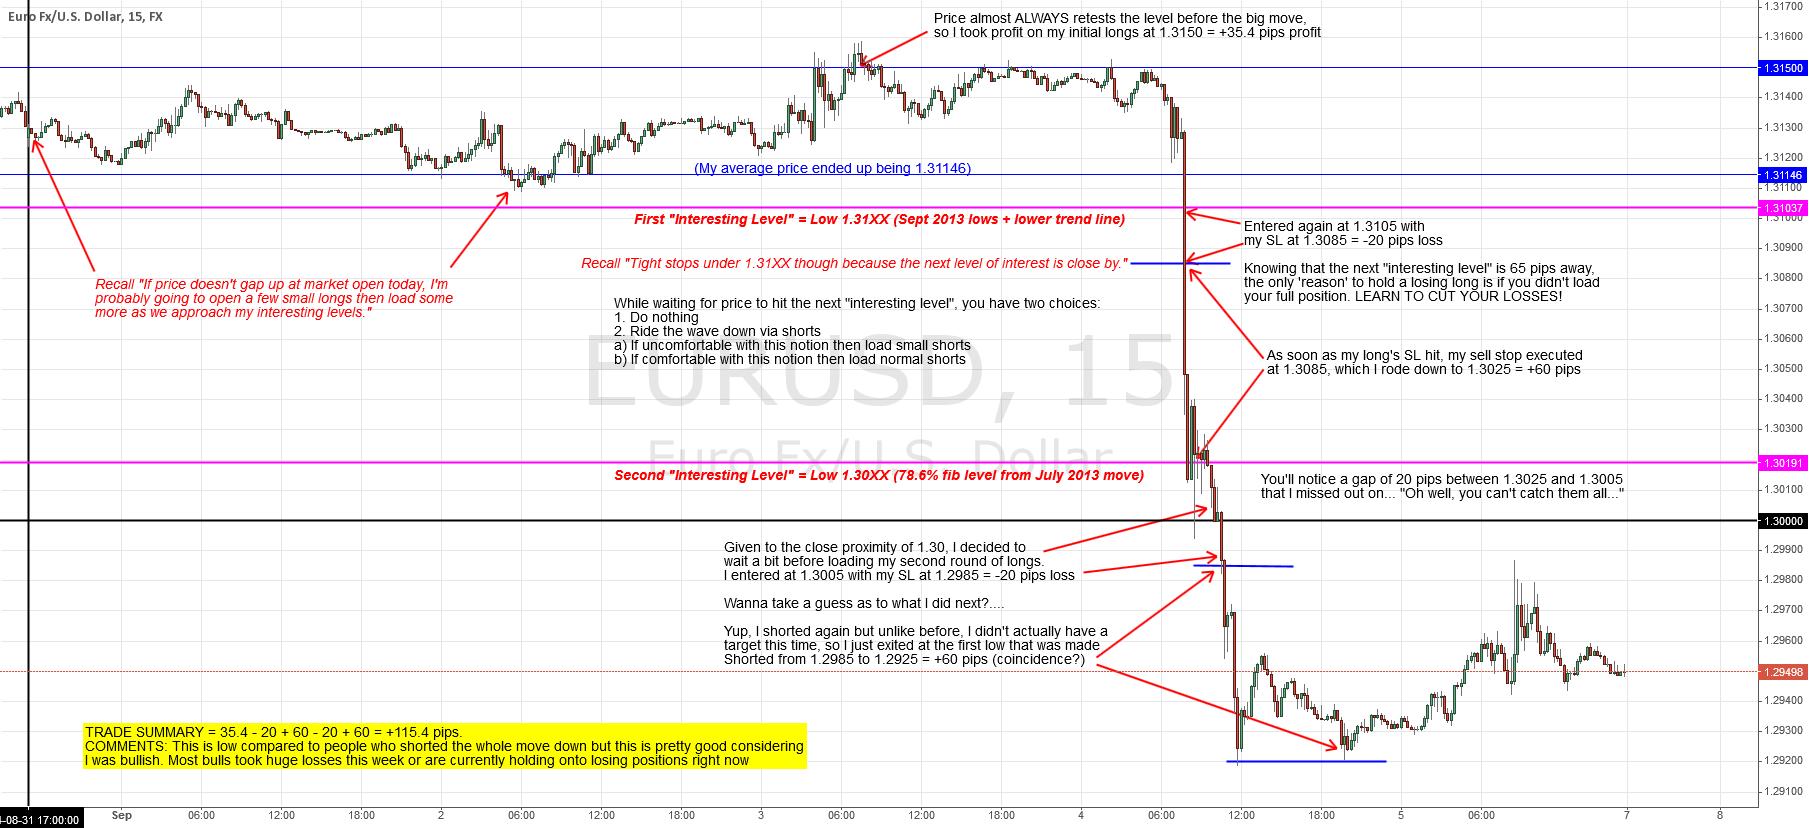 Risk Mitigation - Adaptive (Dynamic) Trading